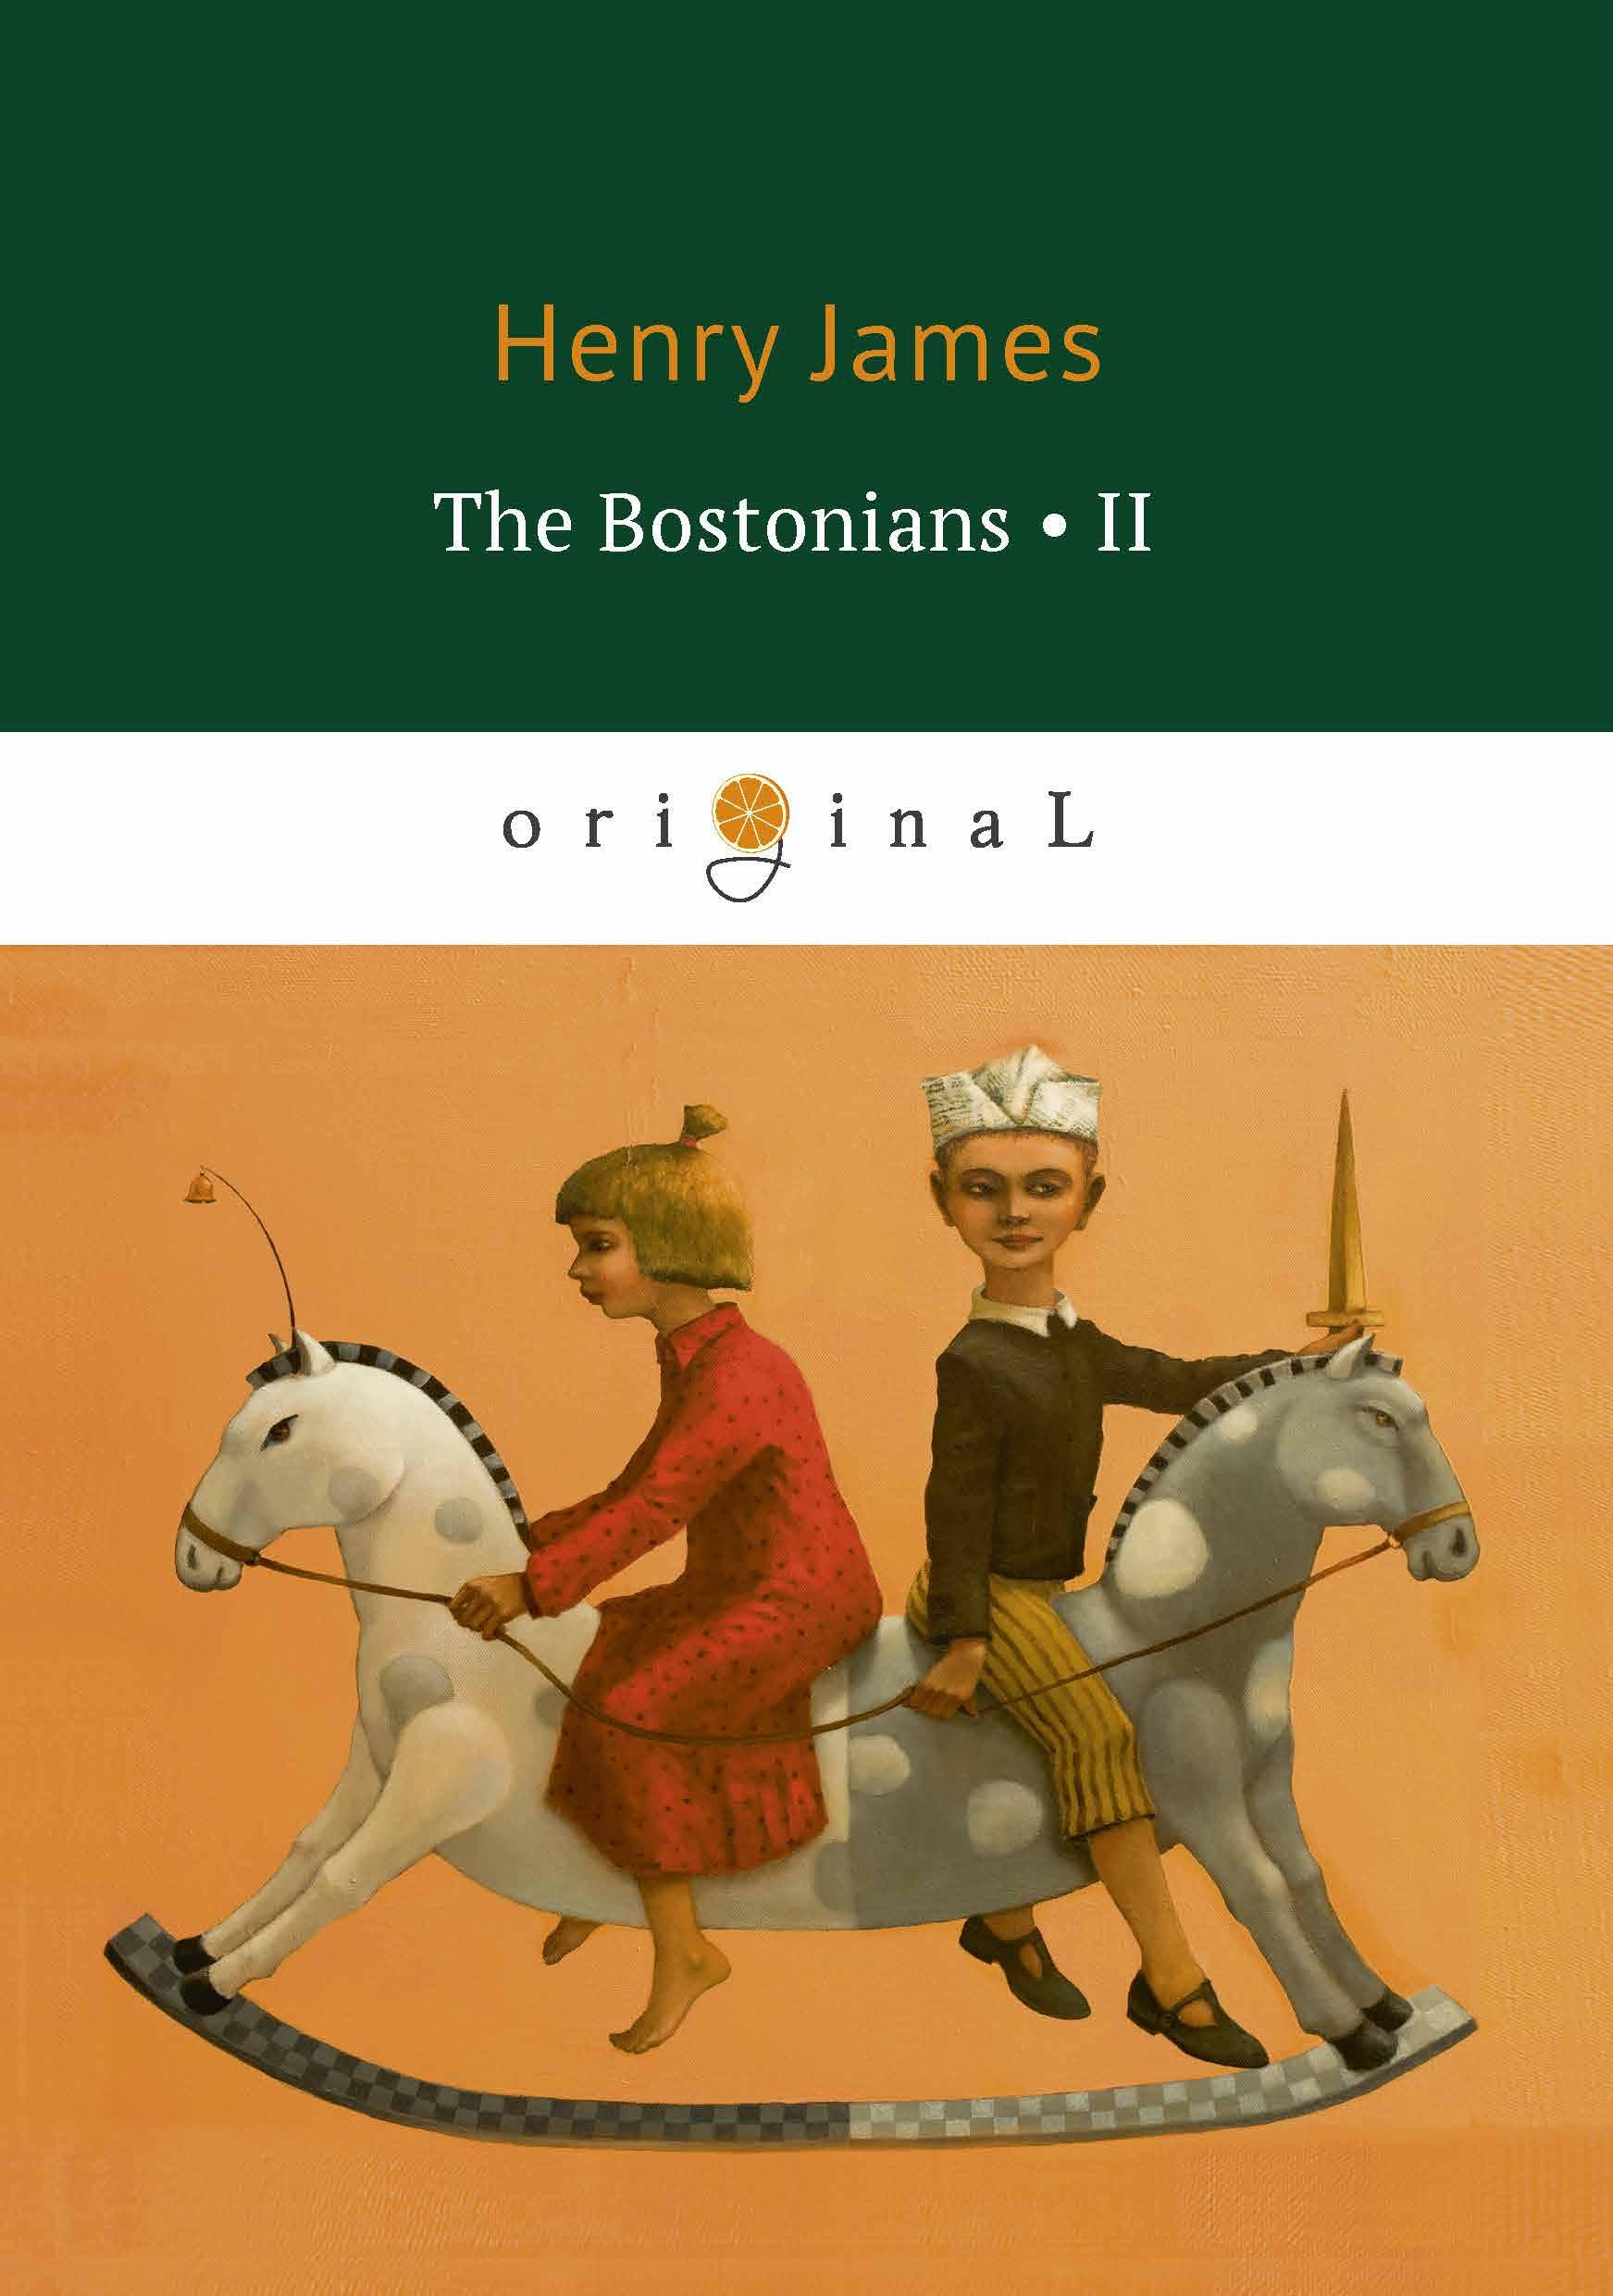 лучшая цена Henry James The Bostonians II